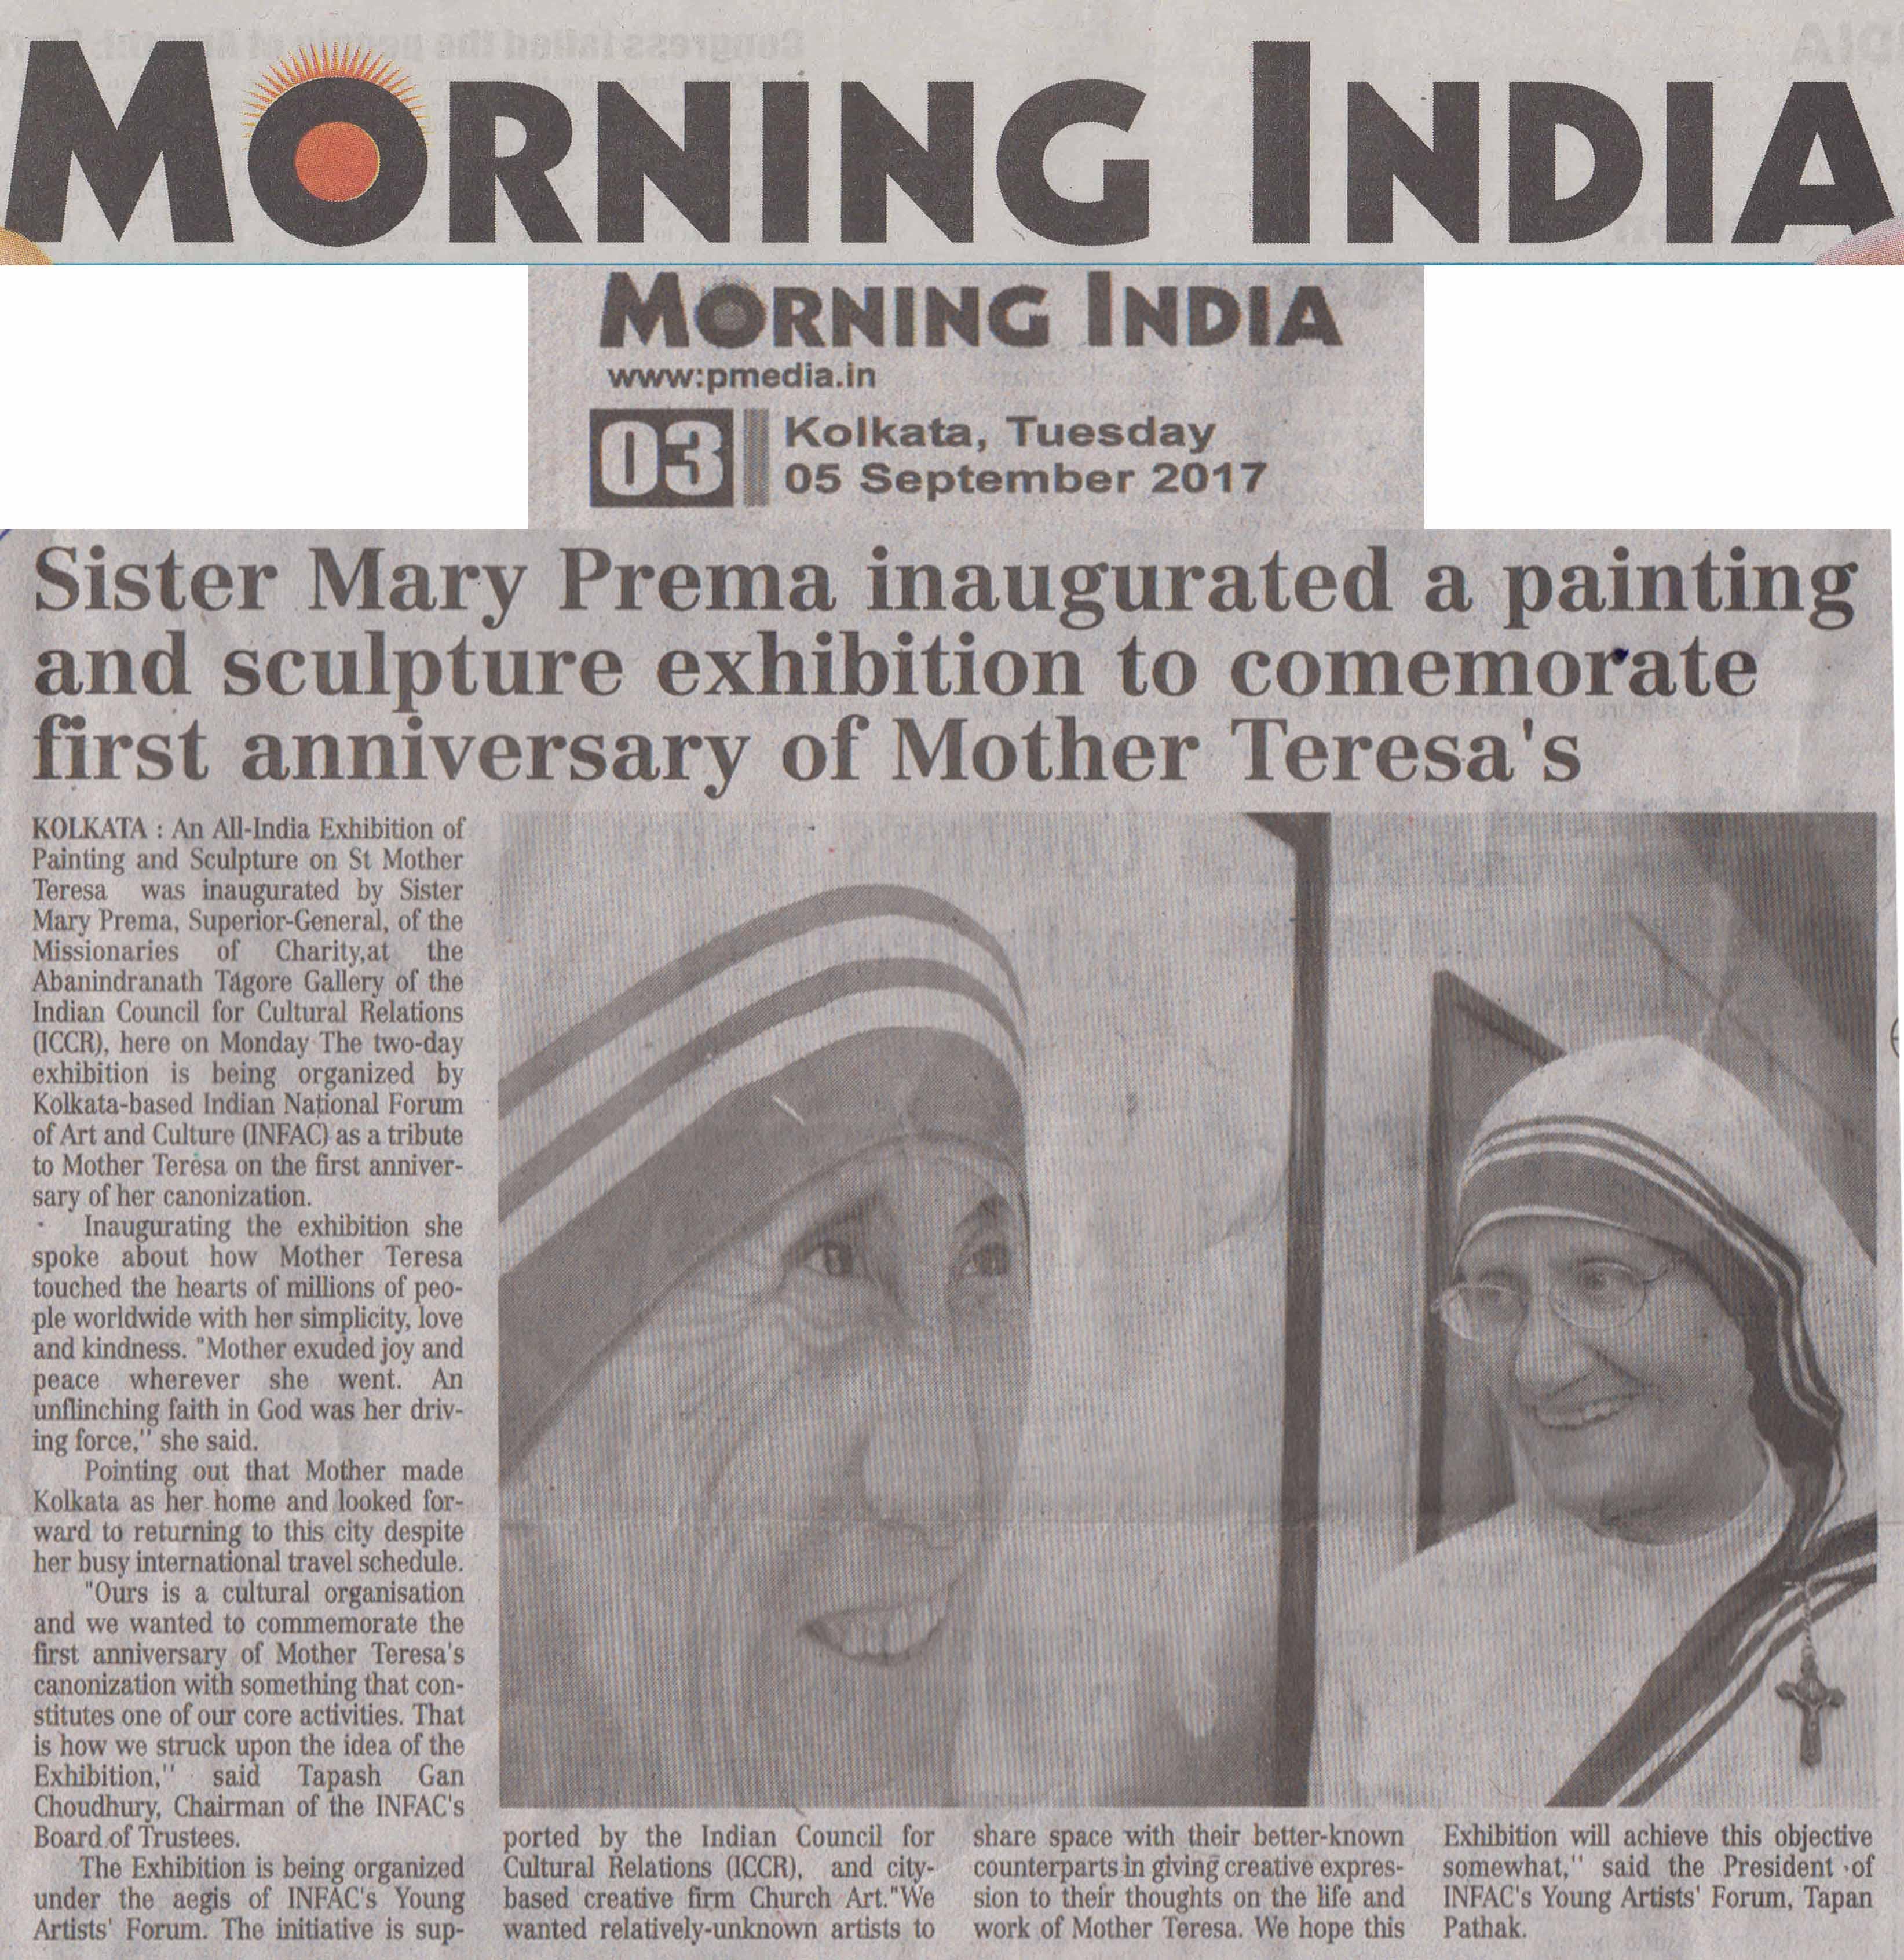 Mother Teresa, Jansatta, Page-3, Date-05.09.2017